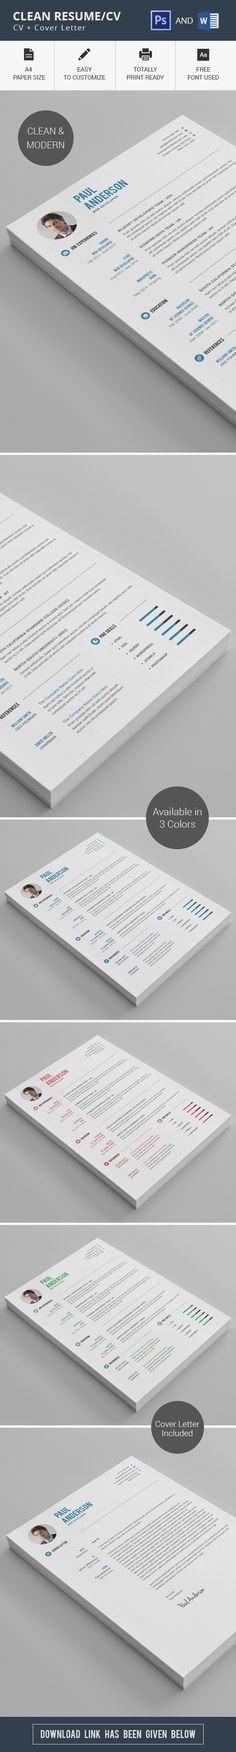 Clean Cv-Resume Resume Templates Pinterest Cv resume - clean resume templates